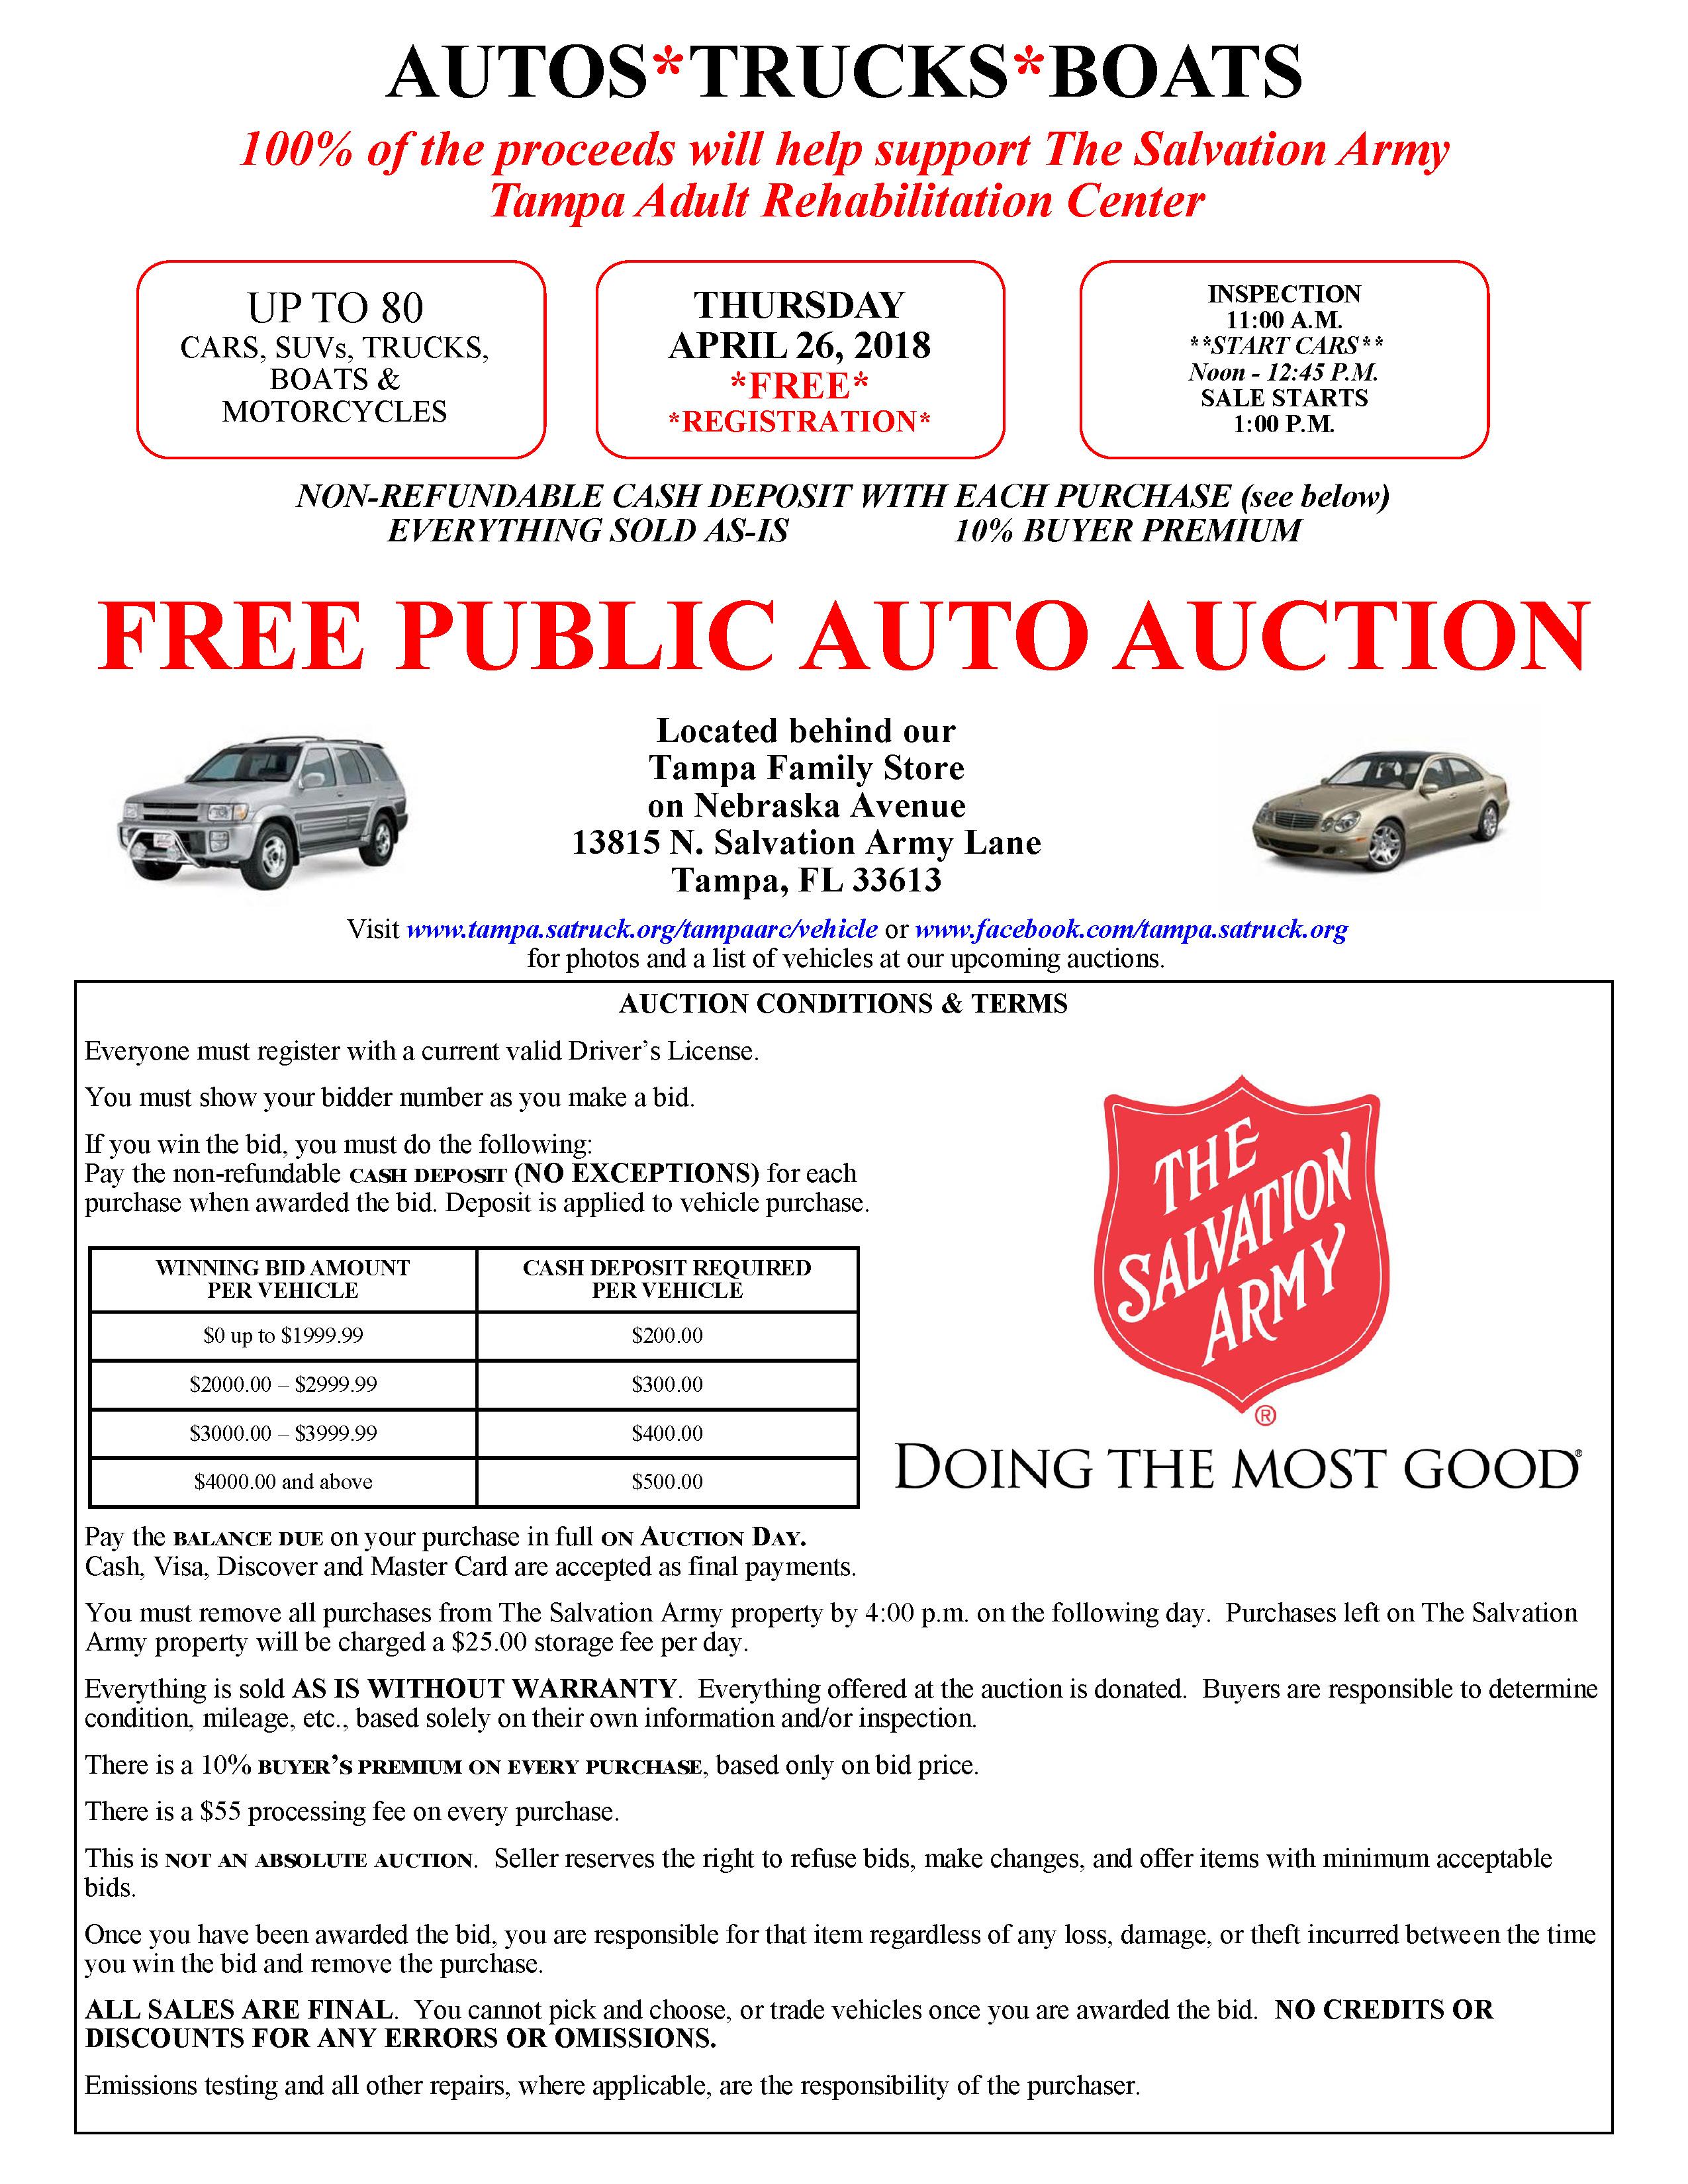 Tampa Florida Salvation Army Auto Auction